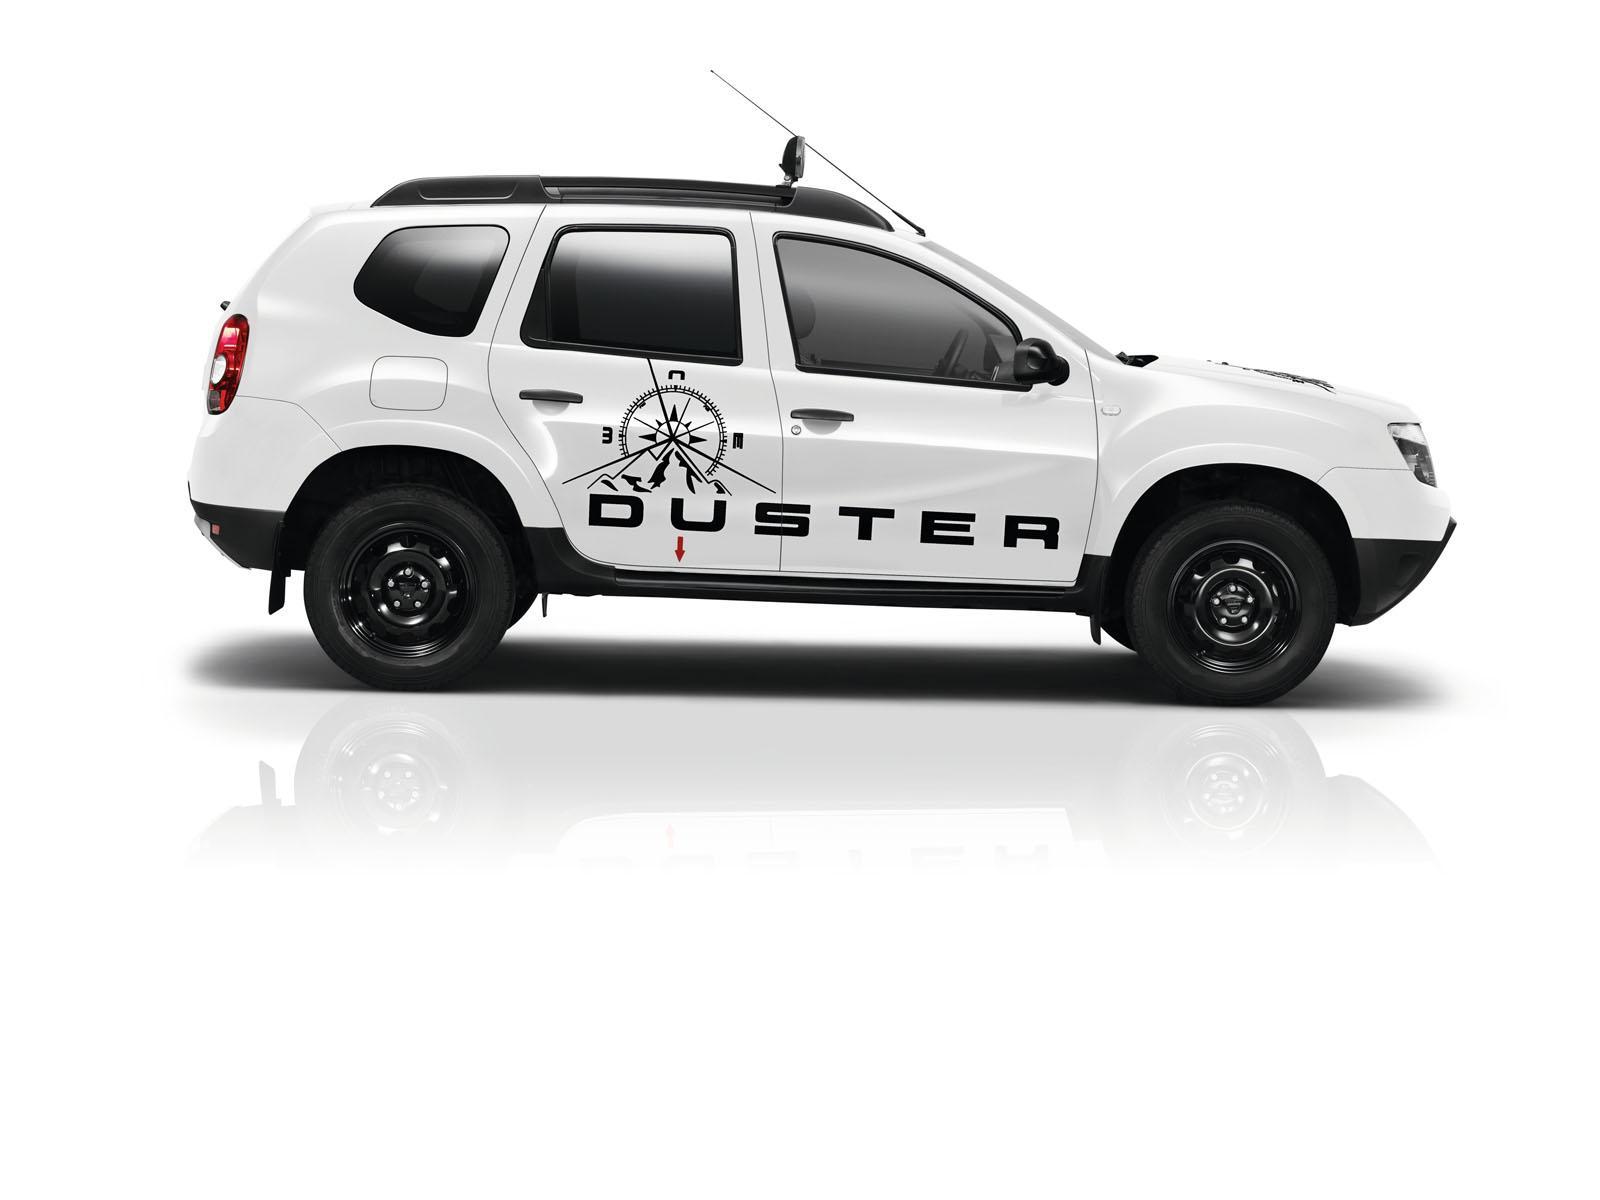 2013 Geneva Motor Show: Dacia Duster Adventure Edition  - фотография №5